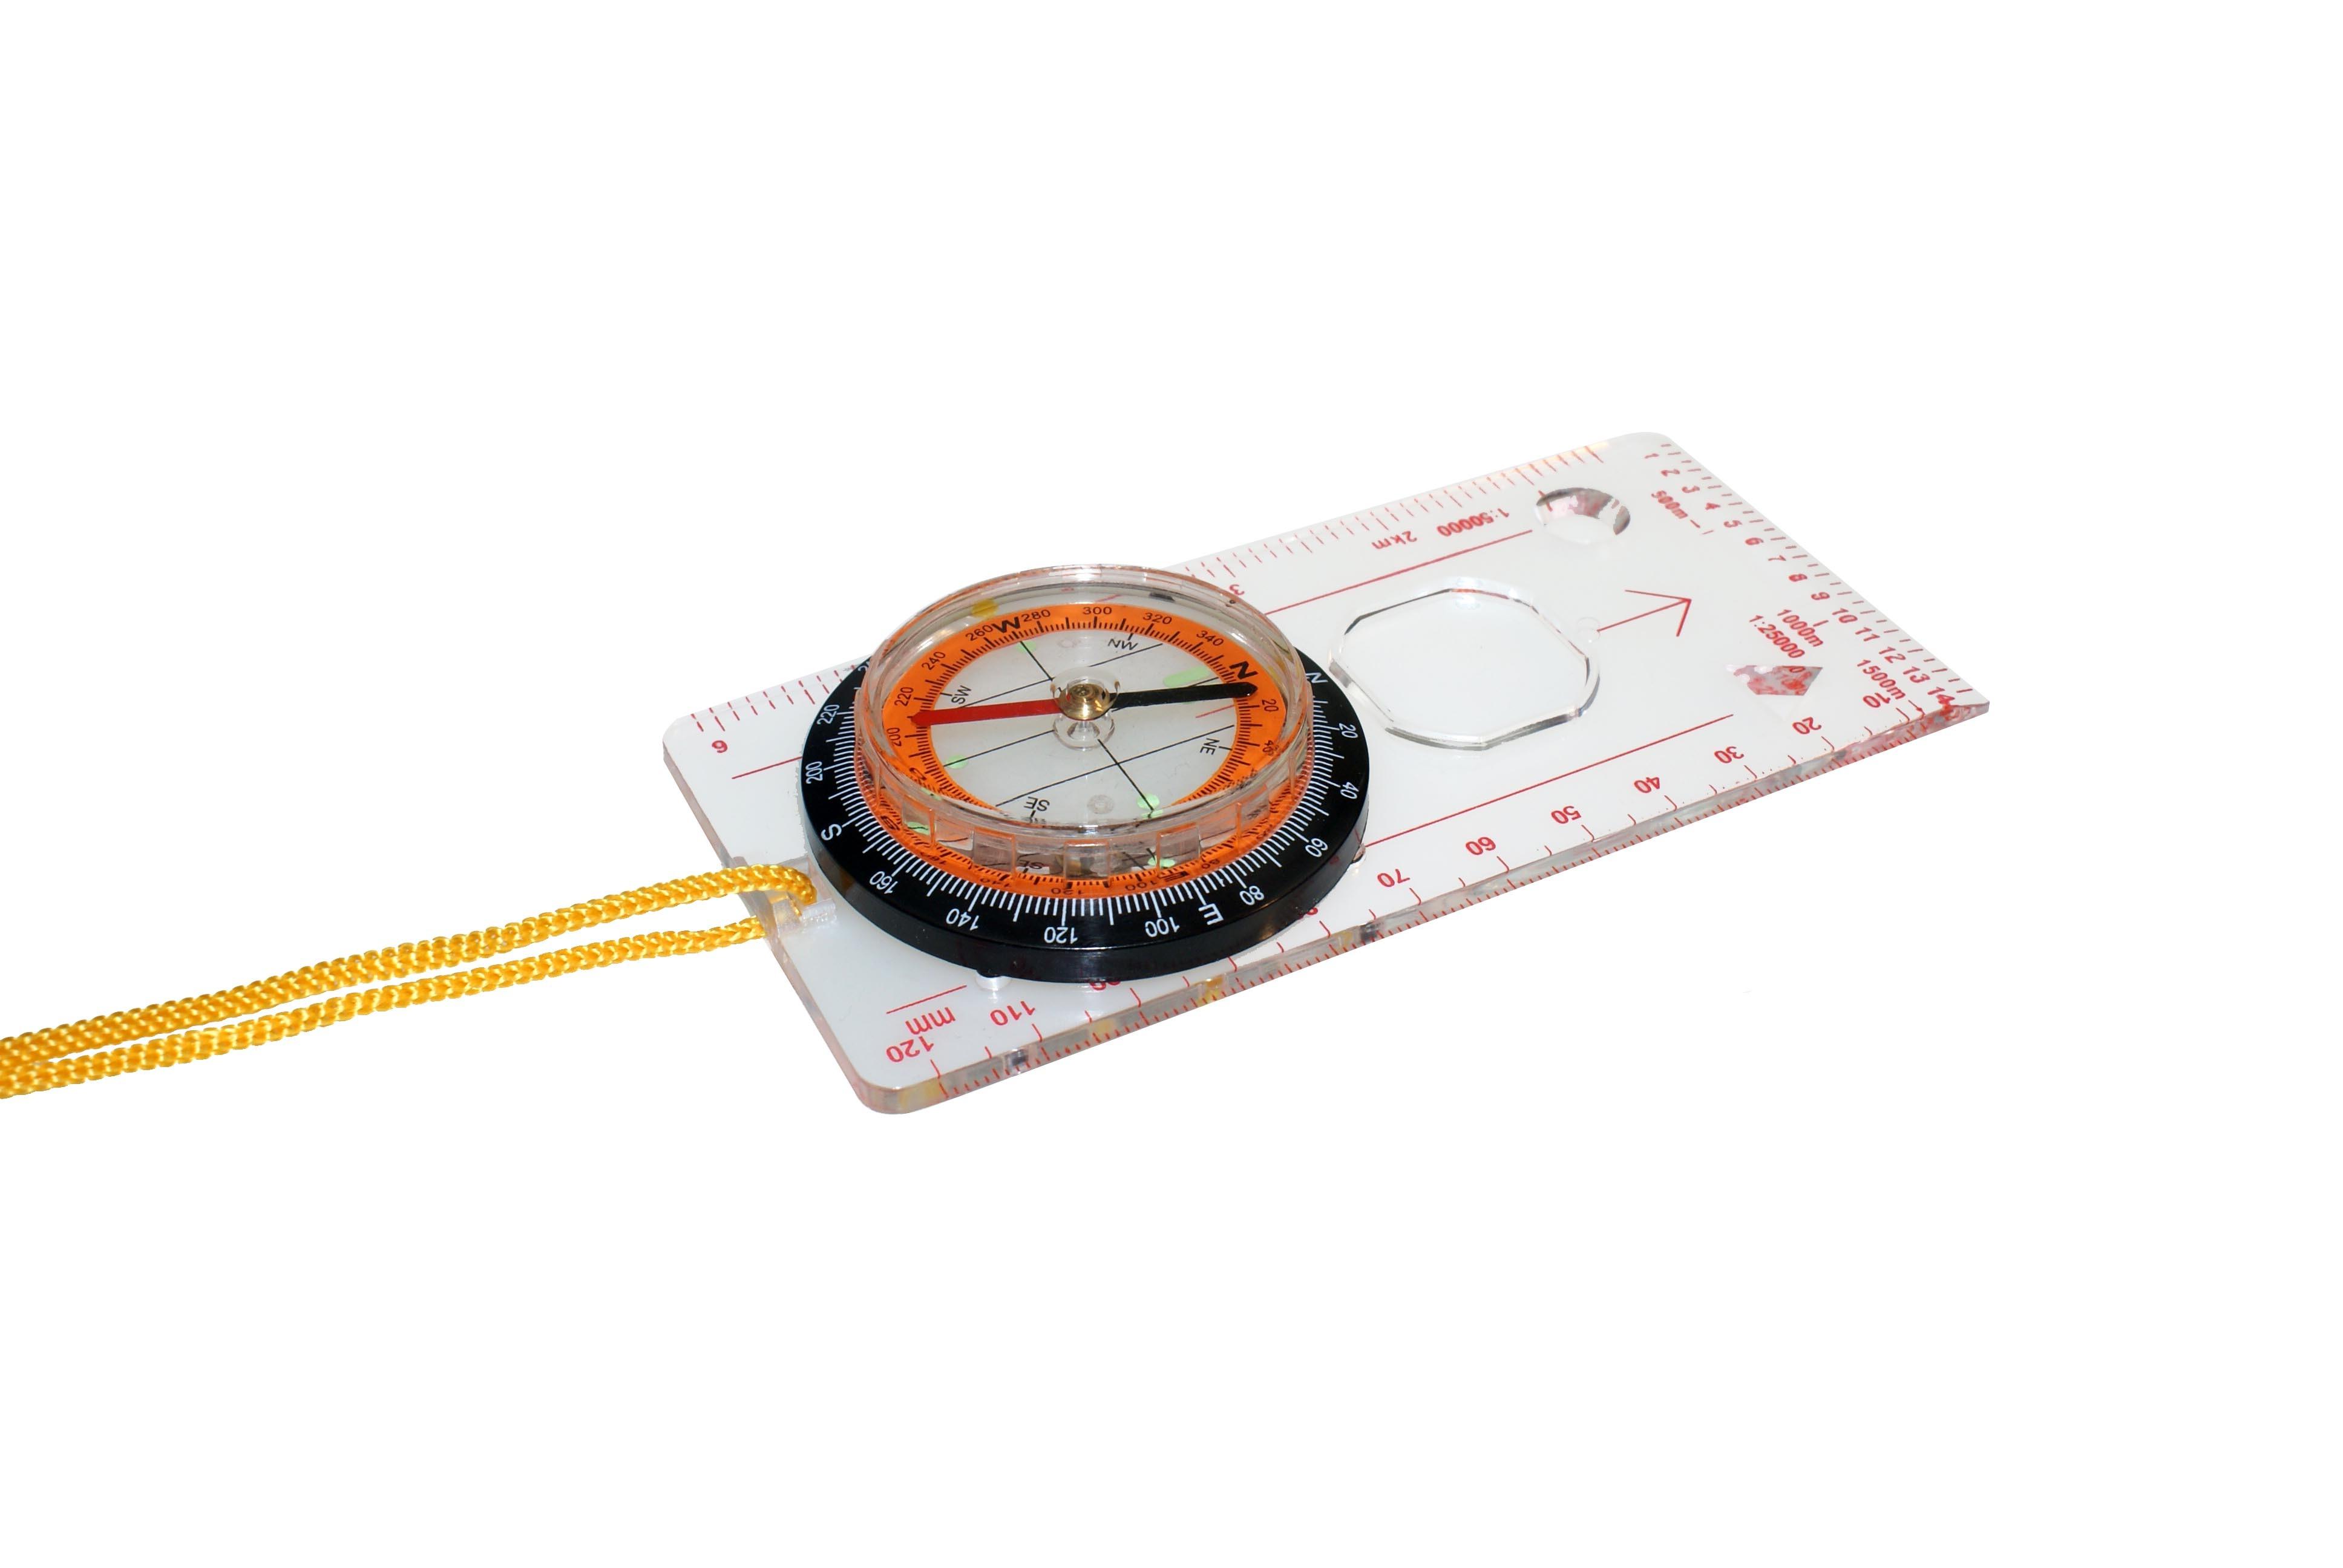 Orienterings kompass